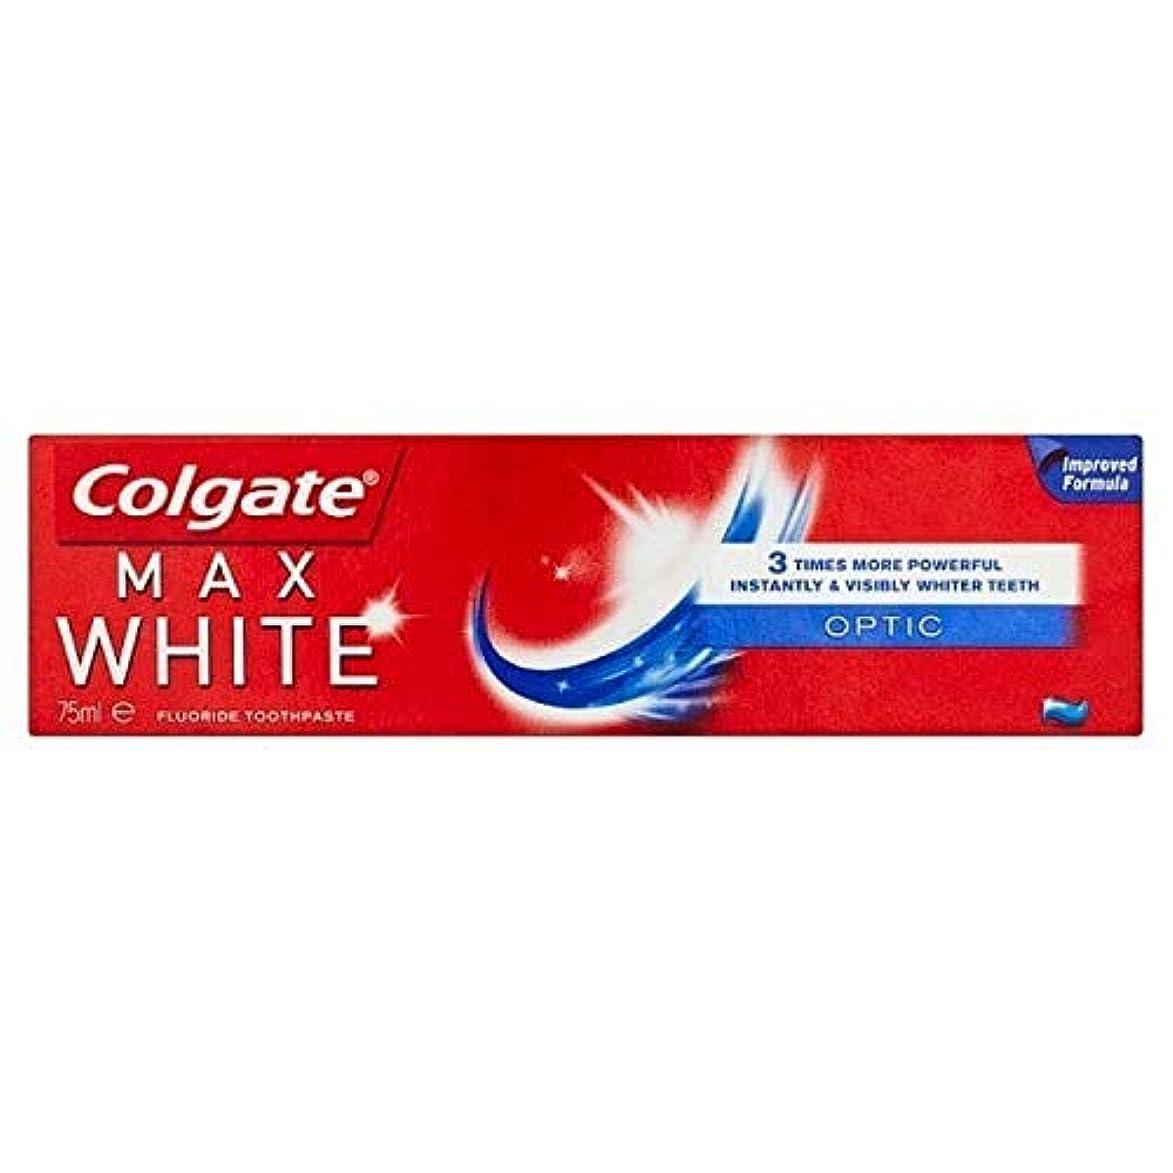 [Colgate ] コルゲート最大白い光ホワイトニング歯磨き粉75ミリリットル - Colgate Max White Optic Whitening Toothpaste 75ml [並行輸入品]